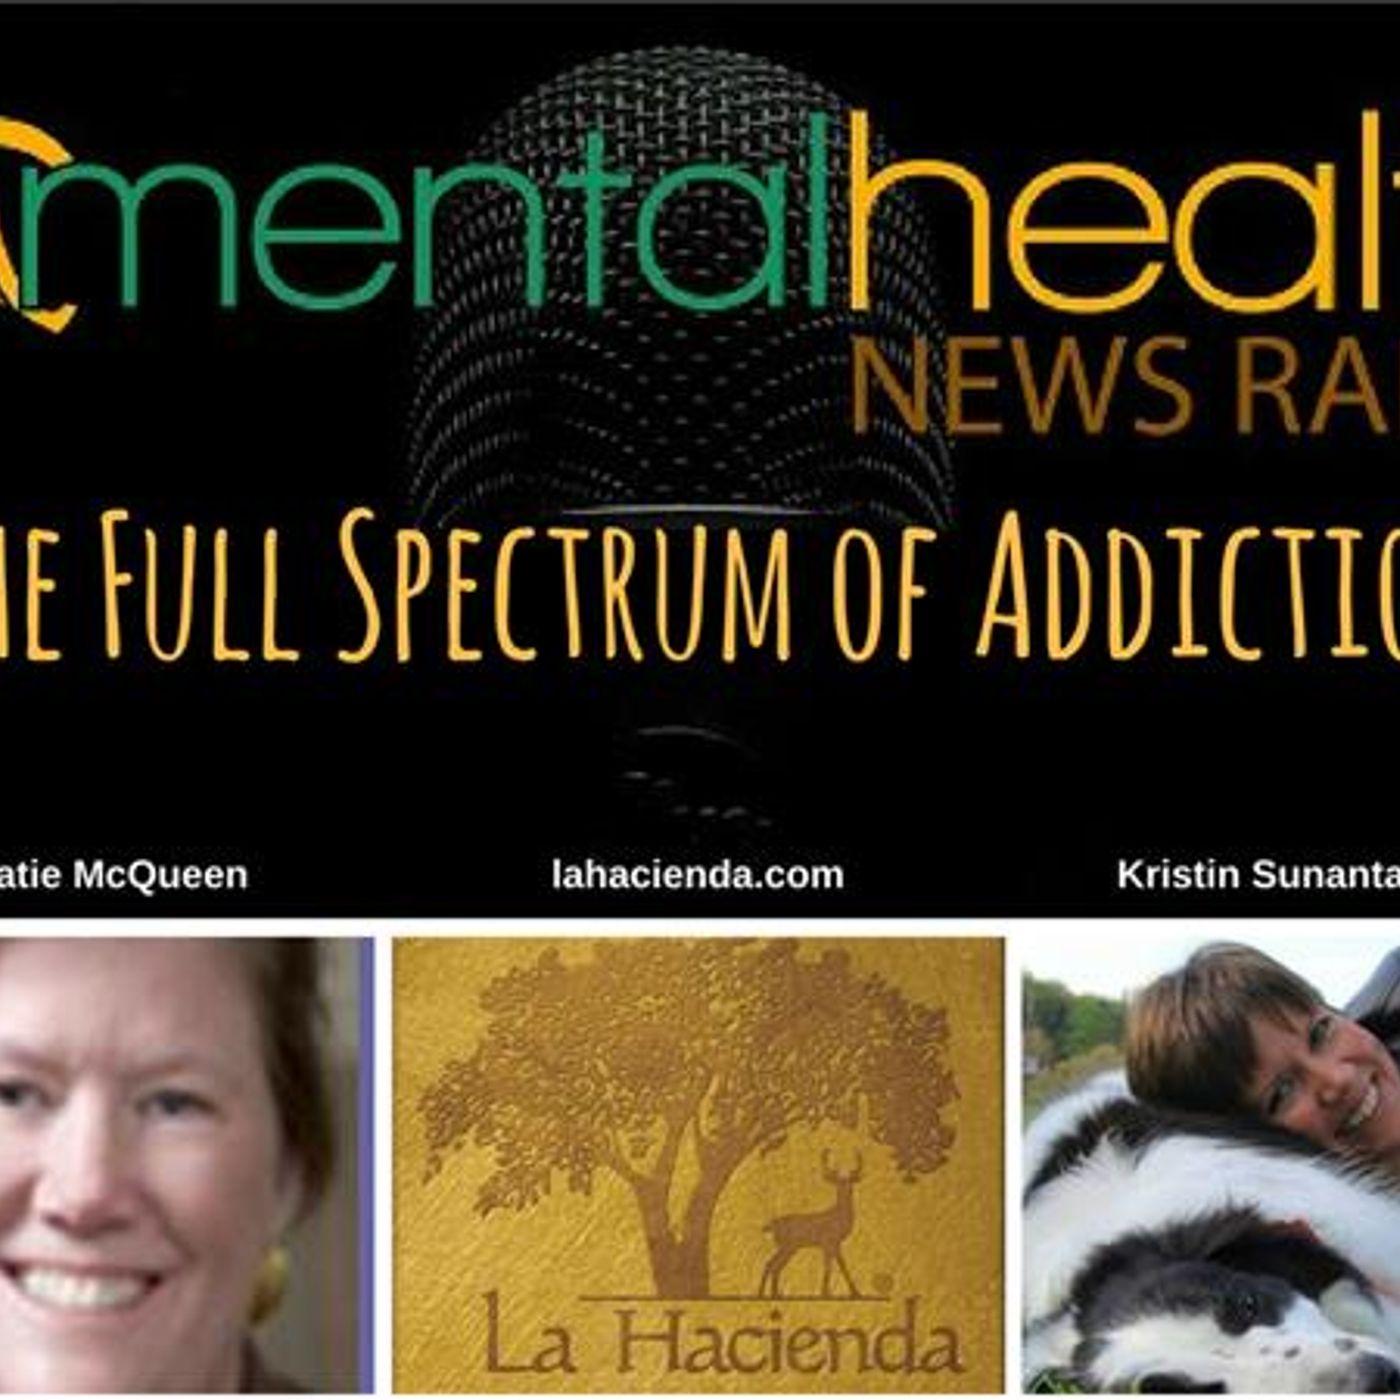 Mental Health News Radio - La Hacienda: The Full Spectrum of Addiction with Dr. Katherine McQueen